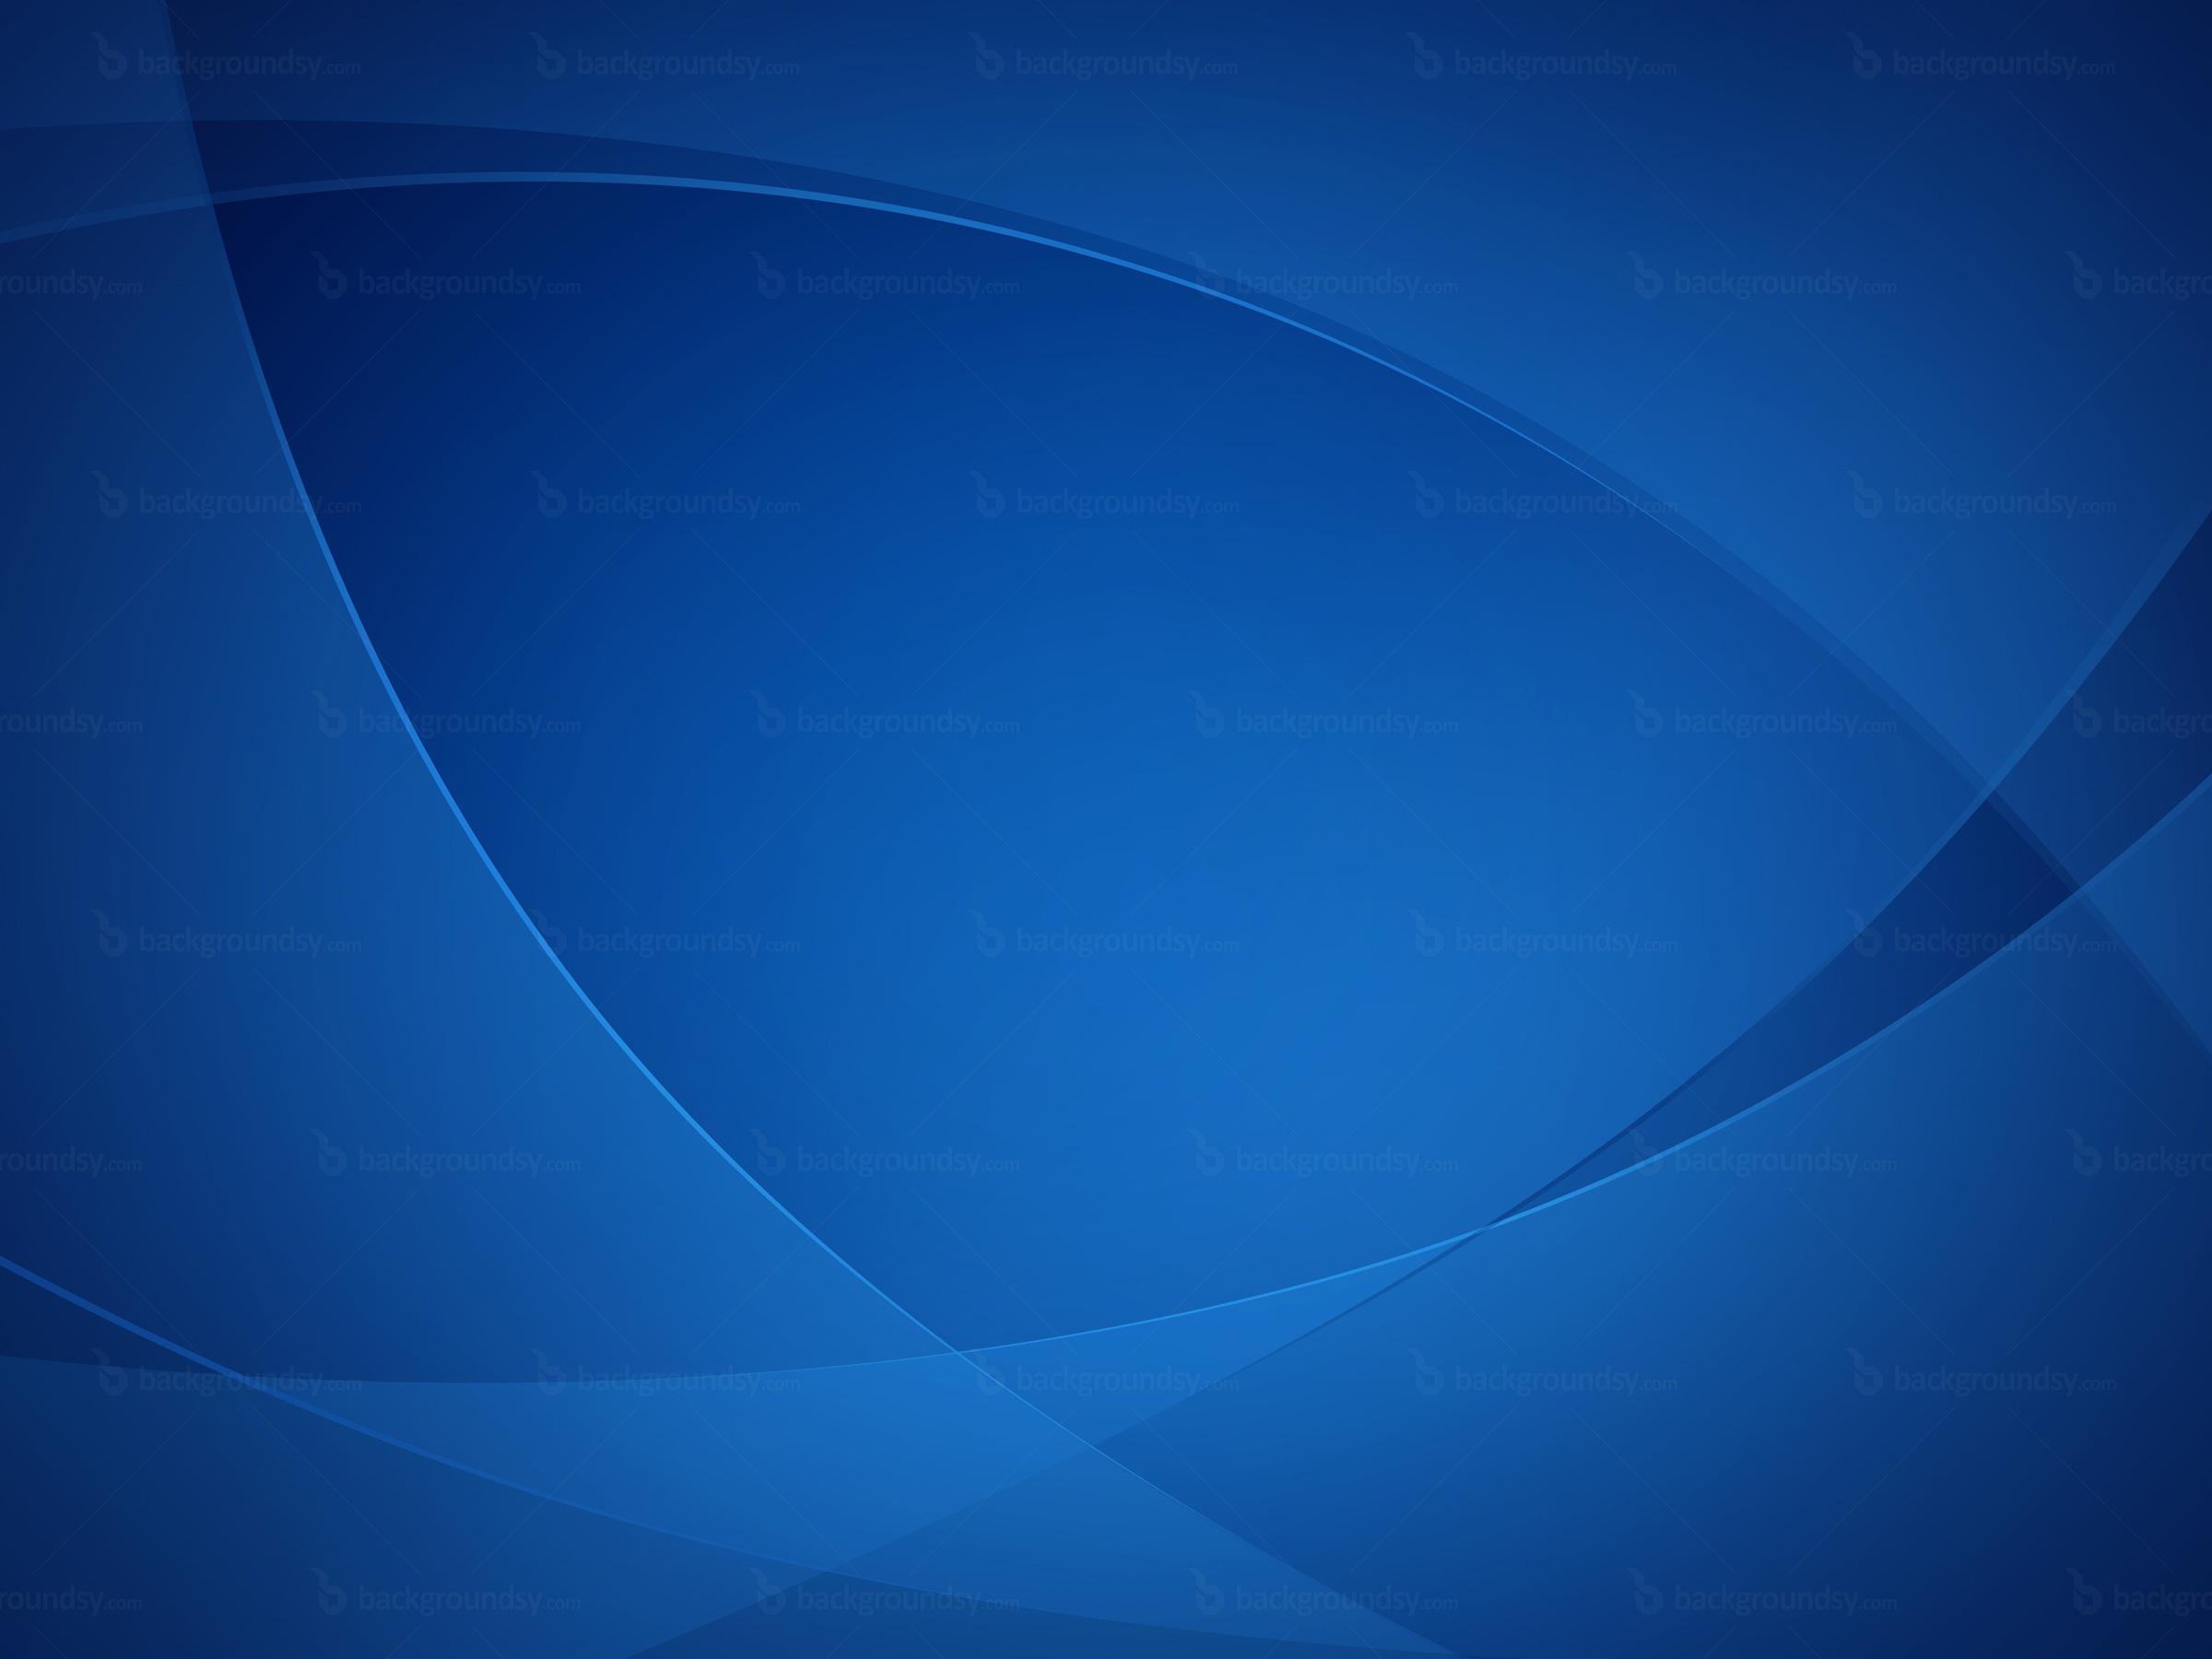 Free Blue background Backgroundsy [2400x1800